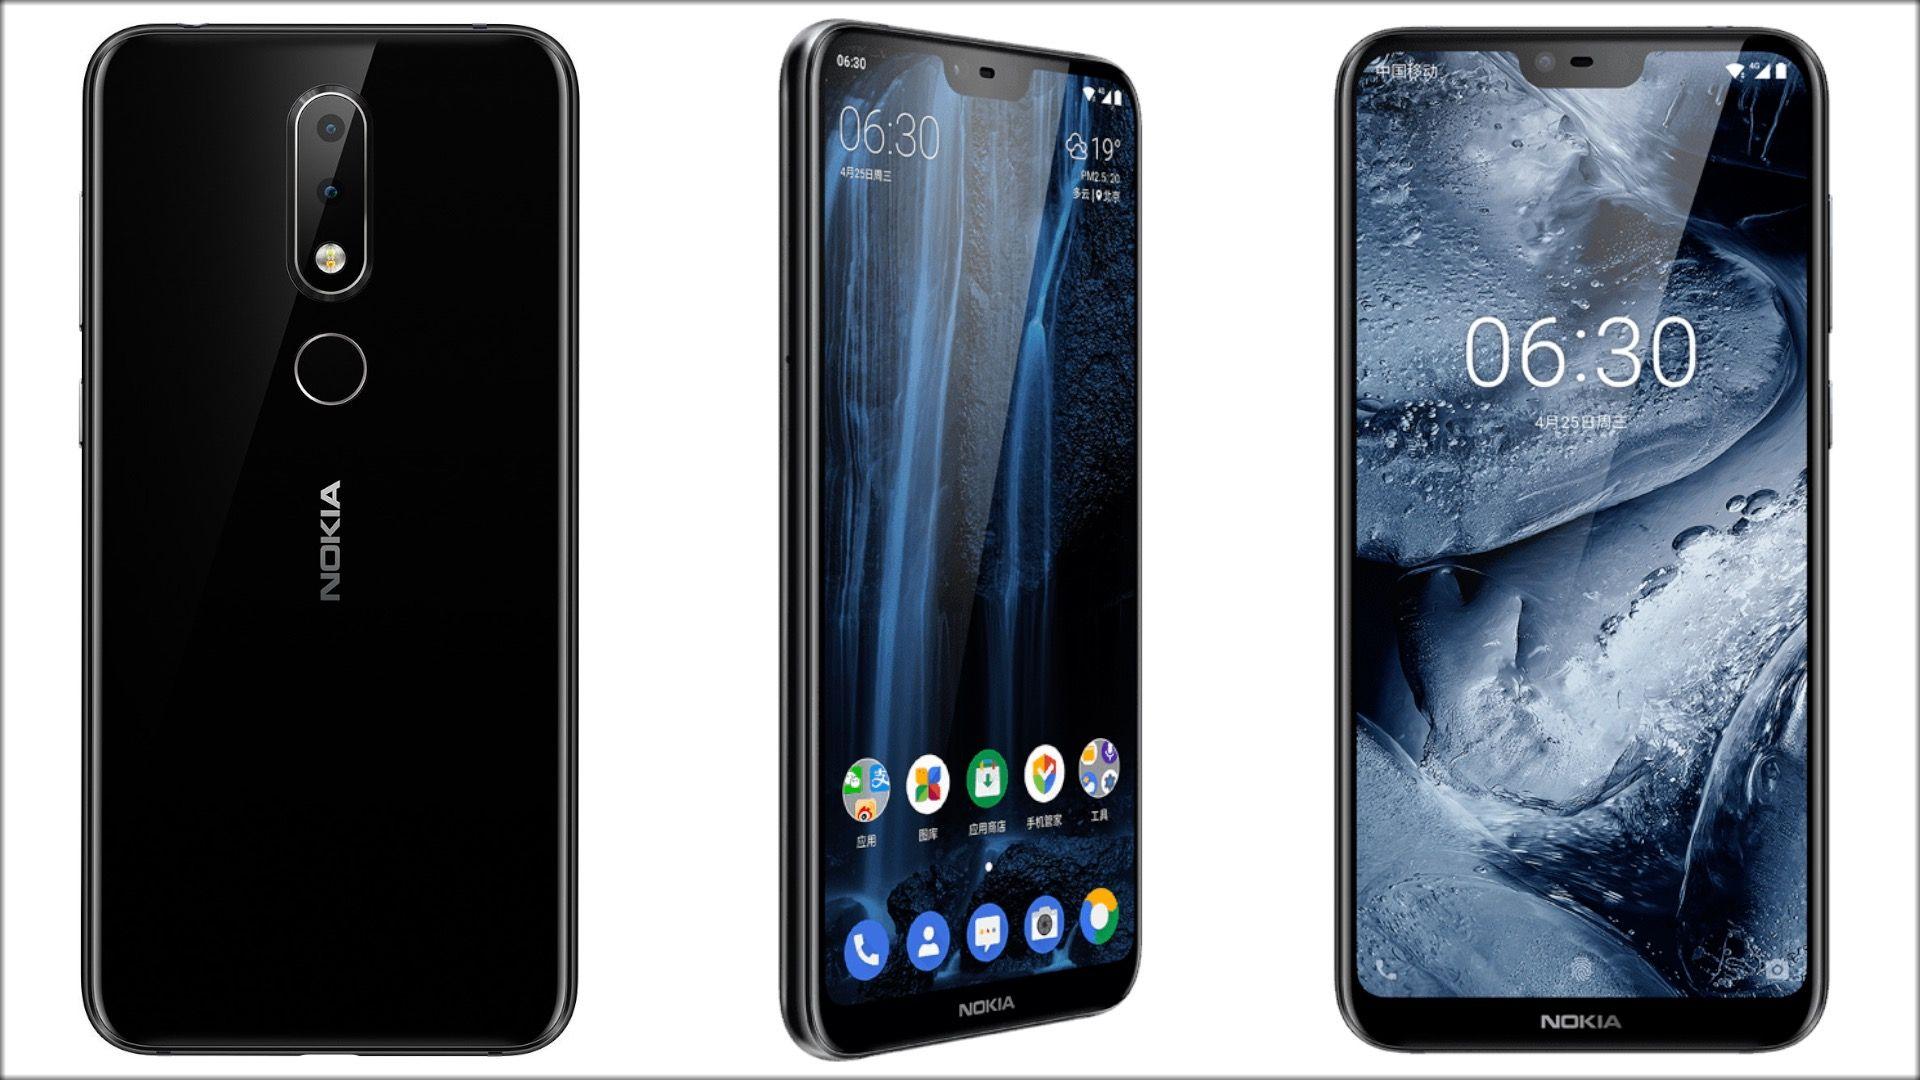 Nokia 6.1 Plus Global Variant Of Nokia X6 Smartphone